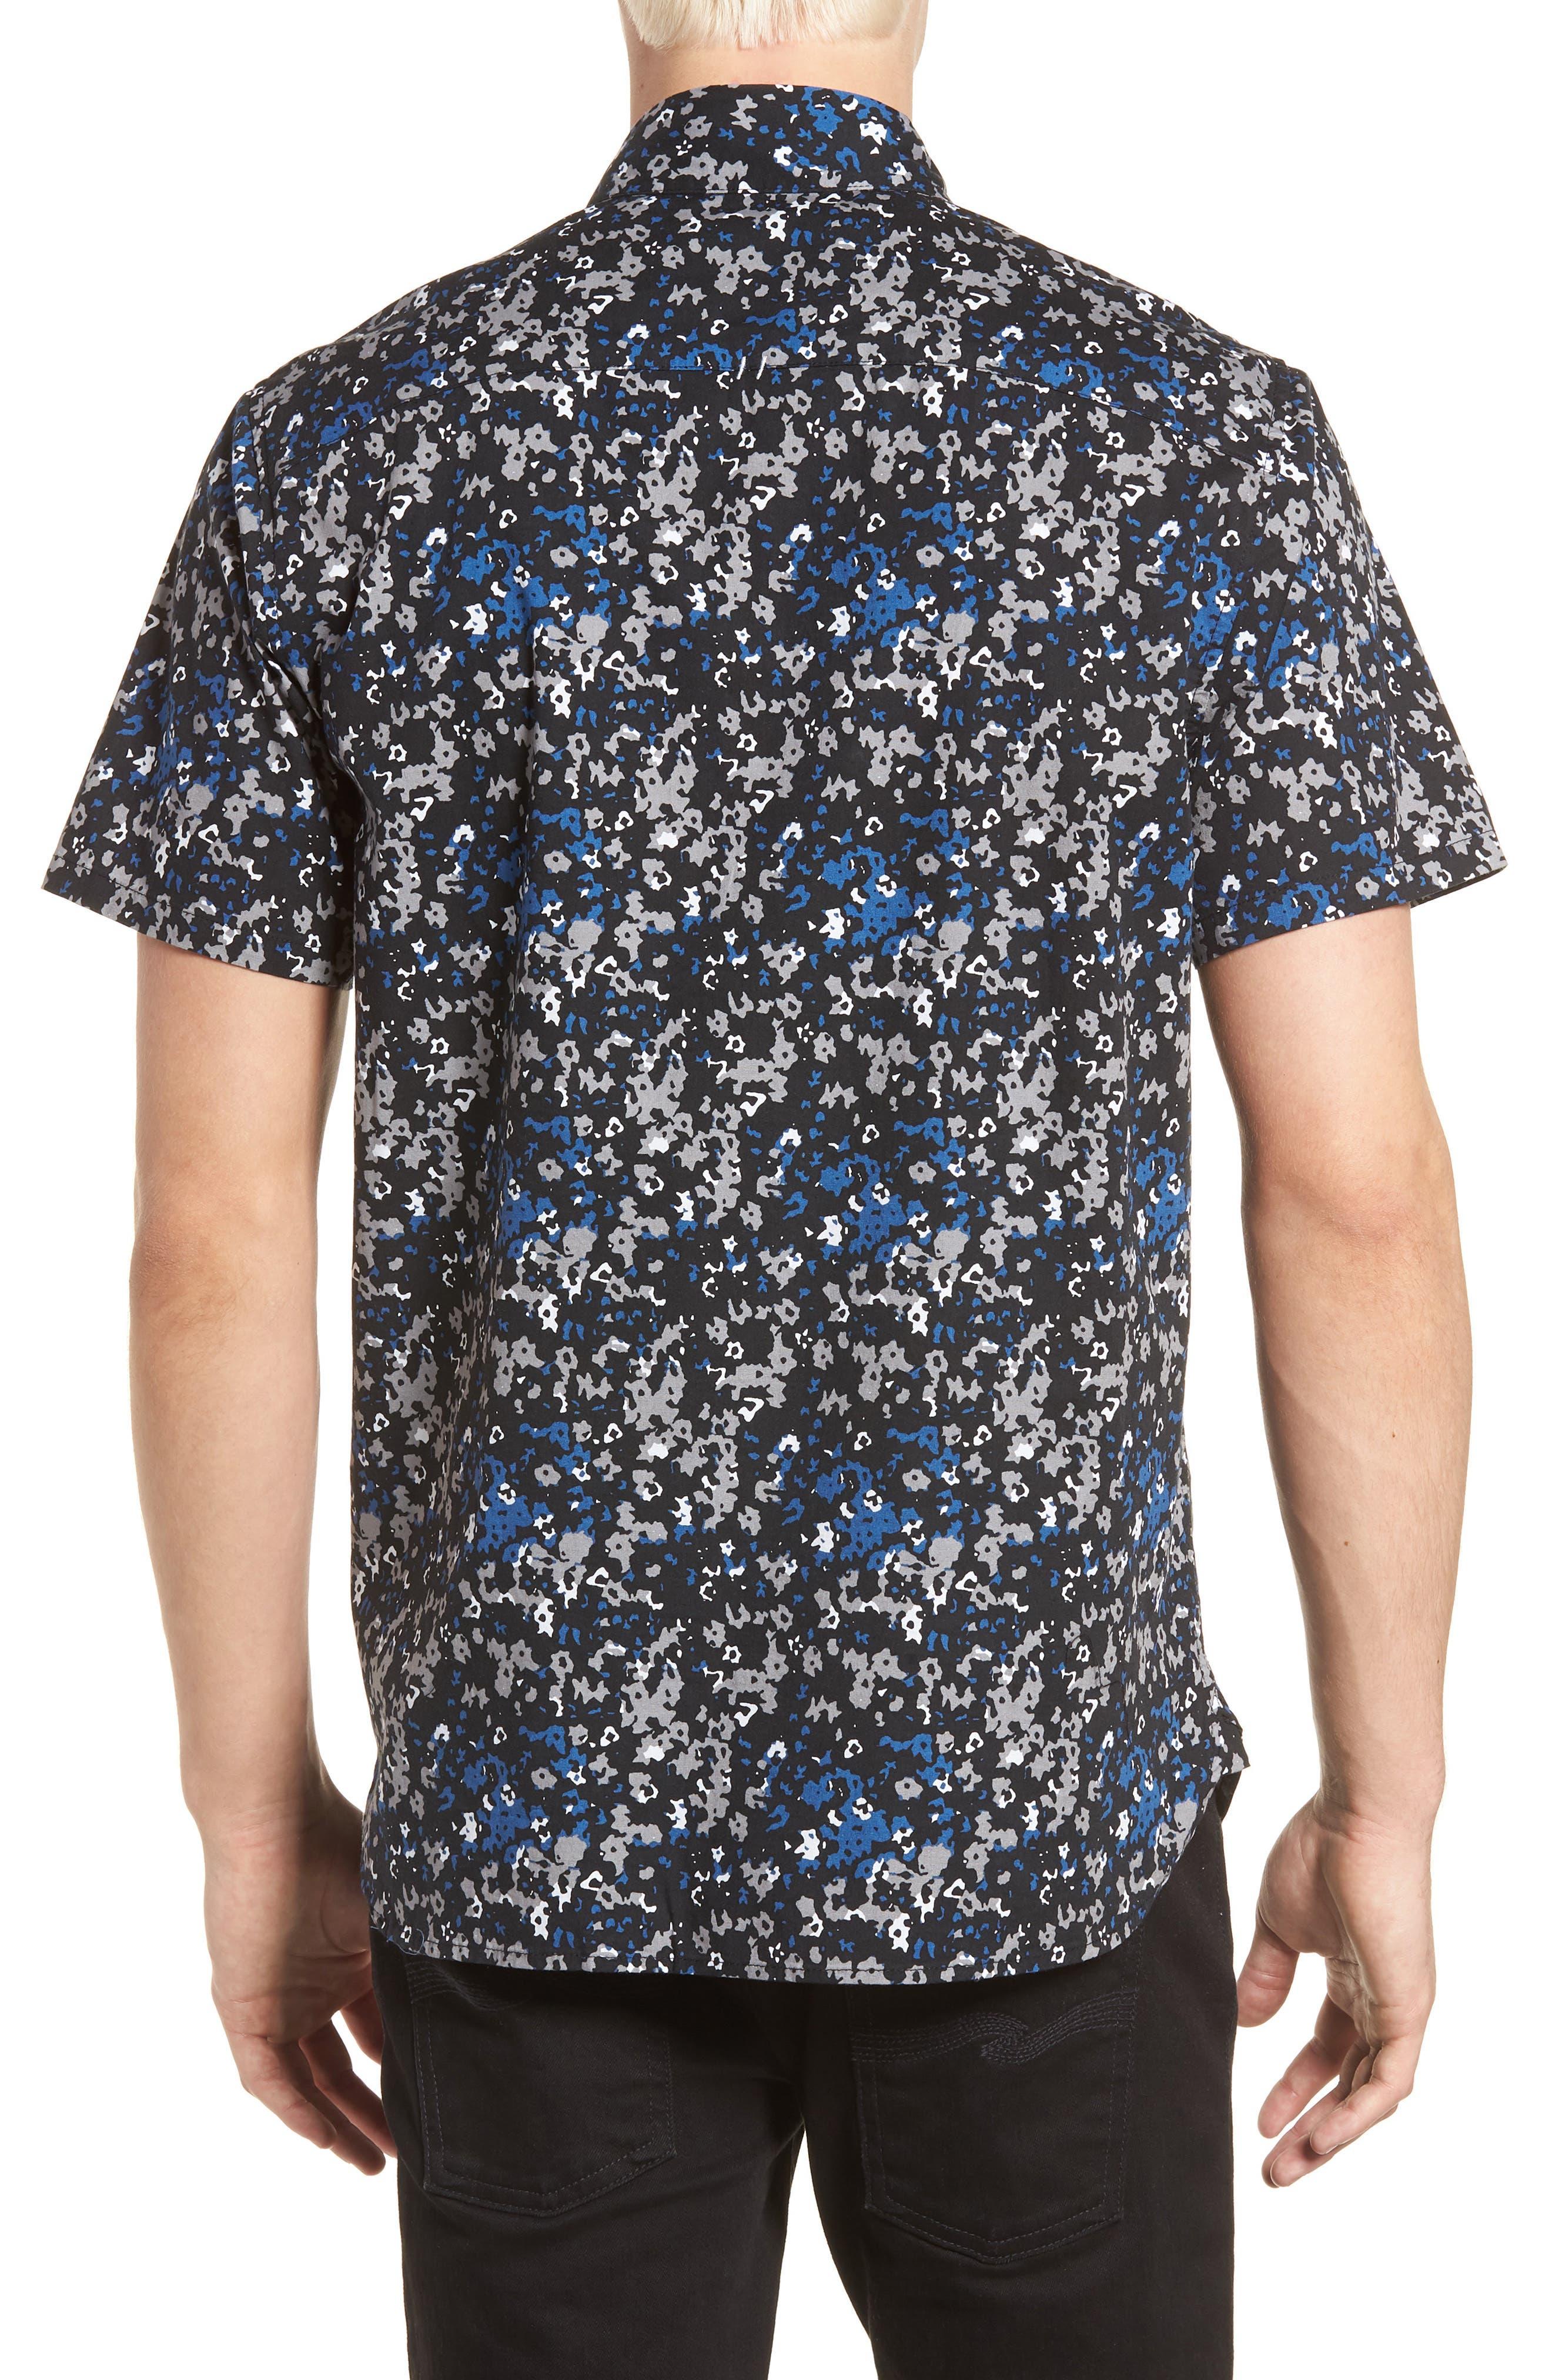 Fowler Woven Shirt,                             Alternate thumbnail 2, color,                             BLACK MICRO FLORAL